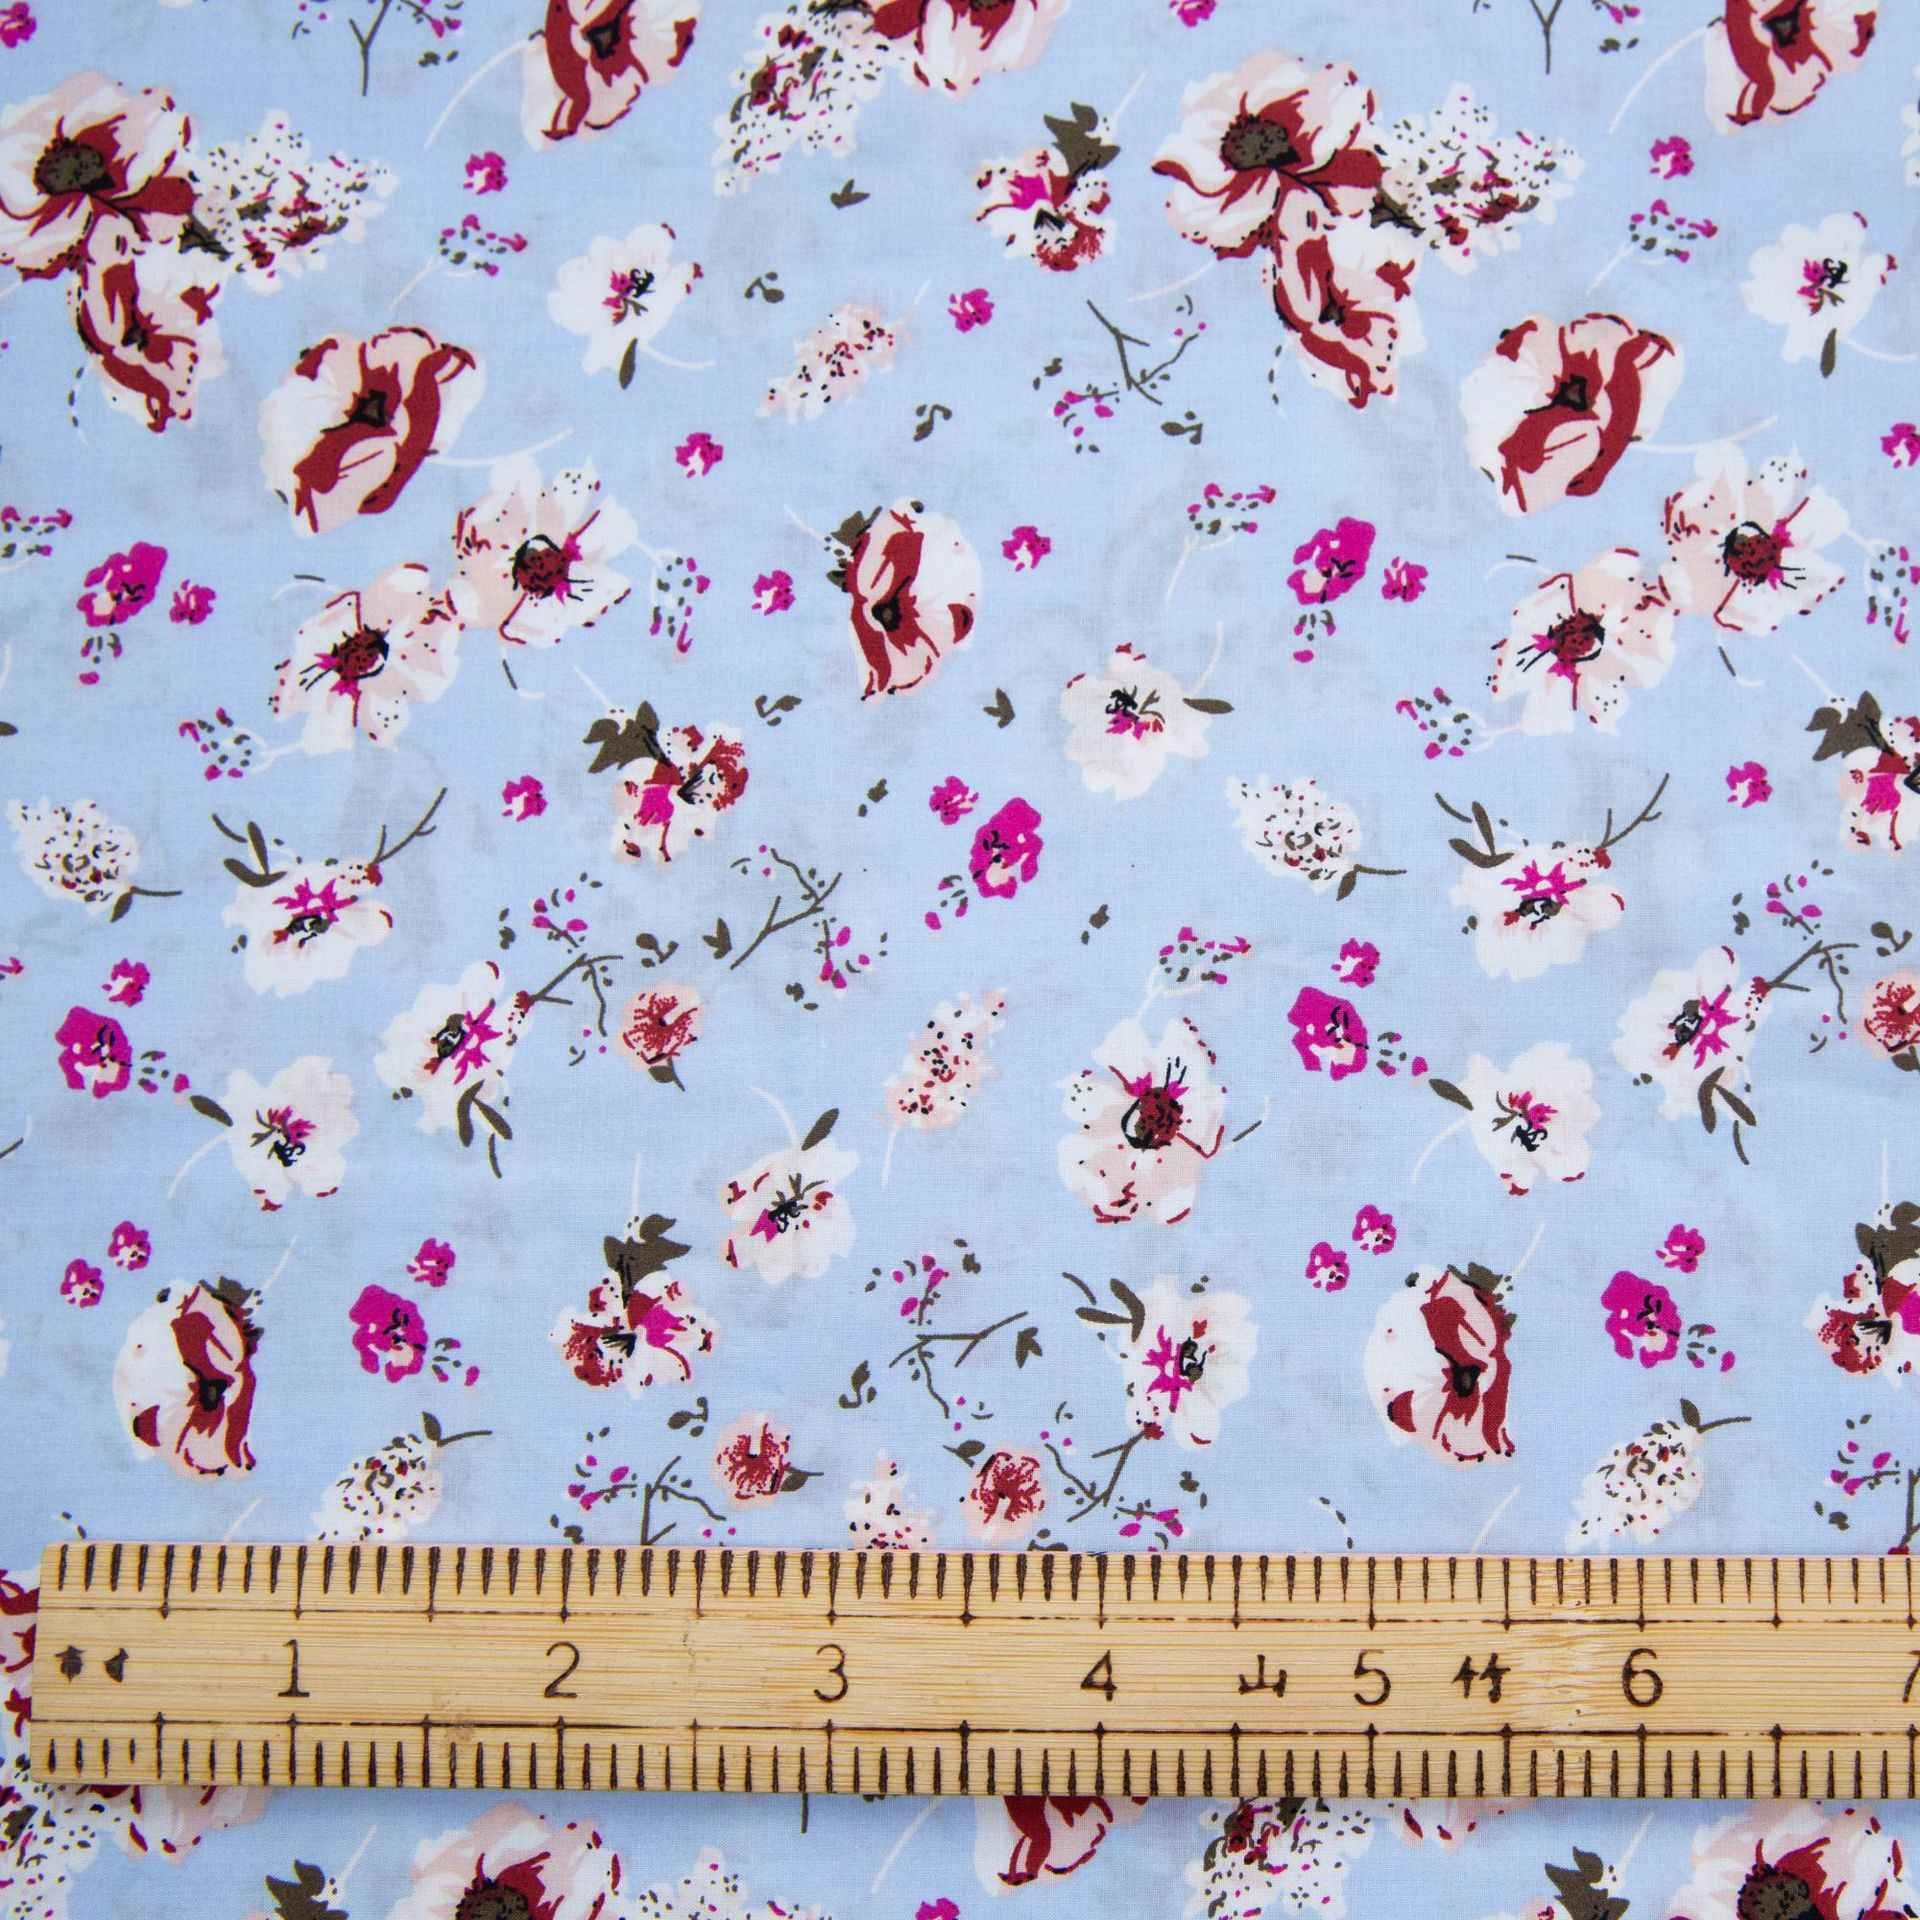 100/% Coton Popeline Tissu Lapin INSIGNES /& Love Hearts on Spots 140 Cm Large